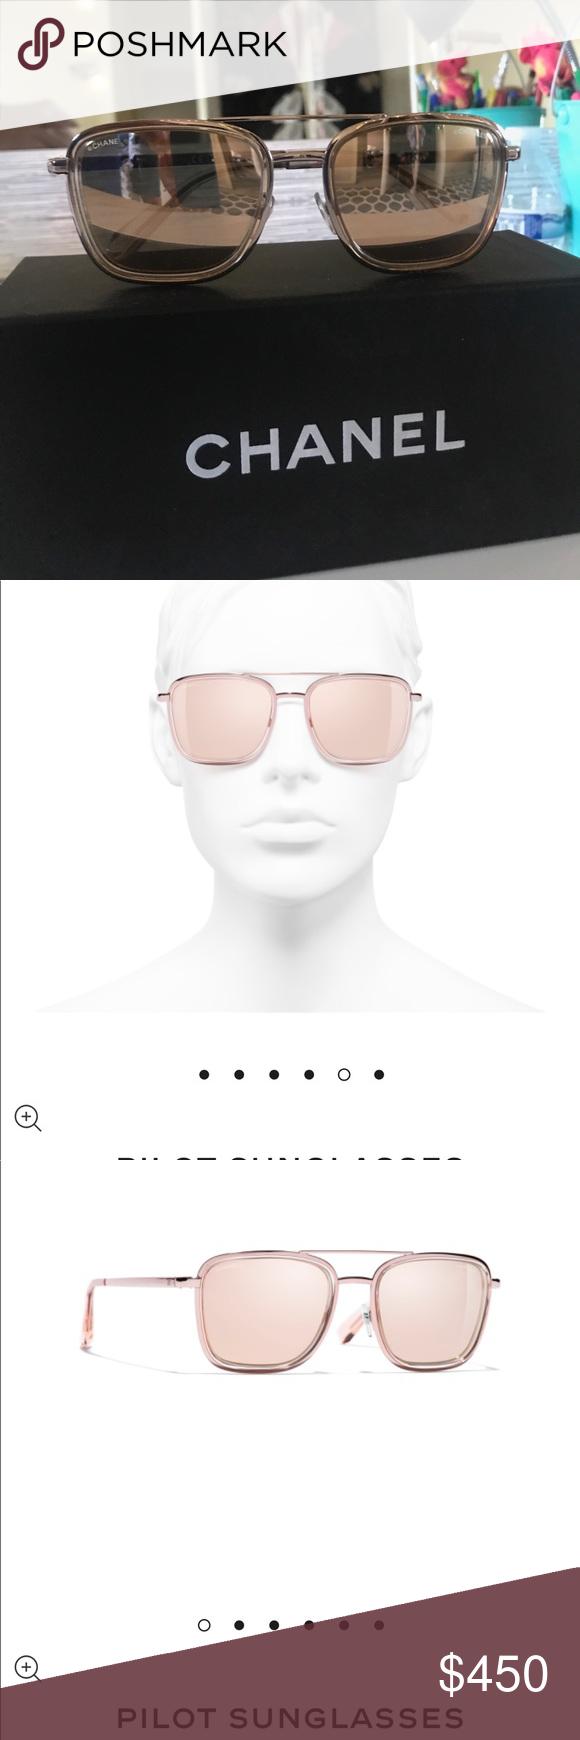 ecf6b0cf7 Chanel sunglasses 18 karat rose gold mirrored authentic Chanel sunglasses.  CH4241 $585 regular prices.